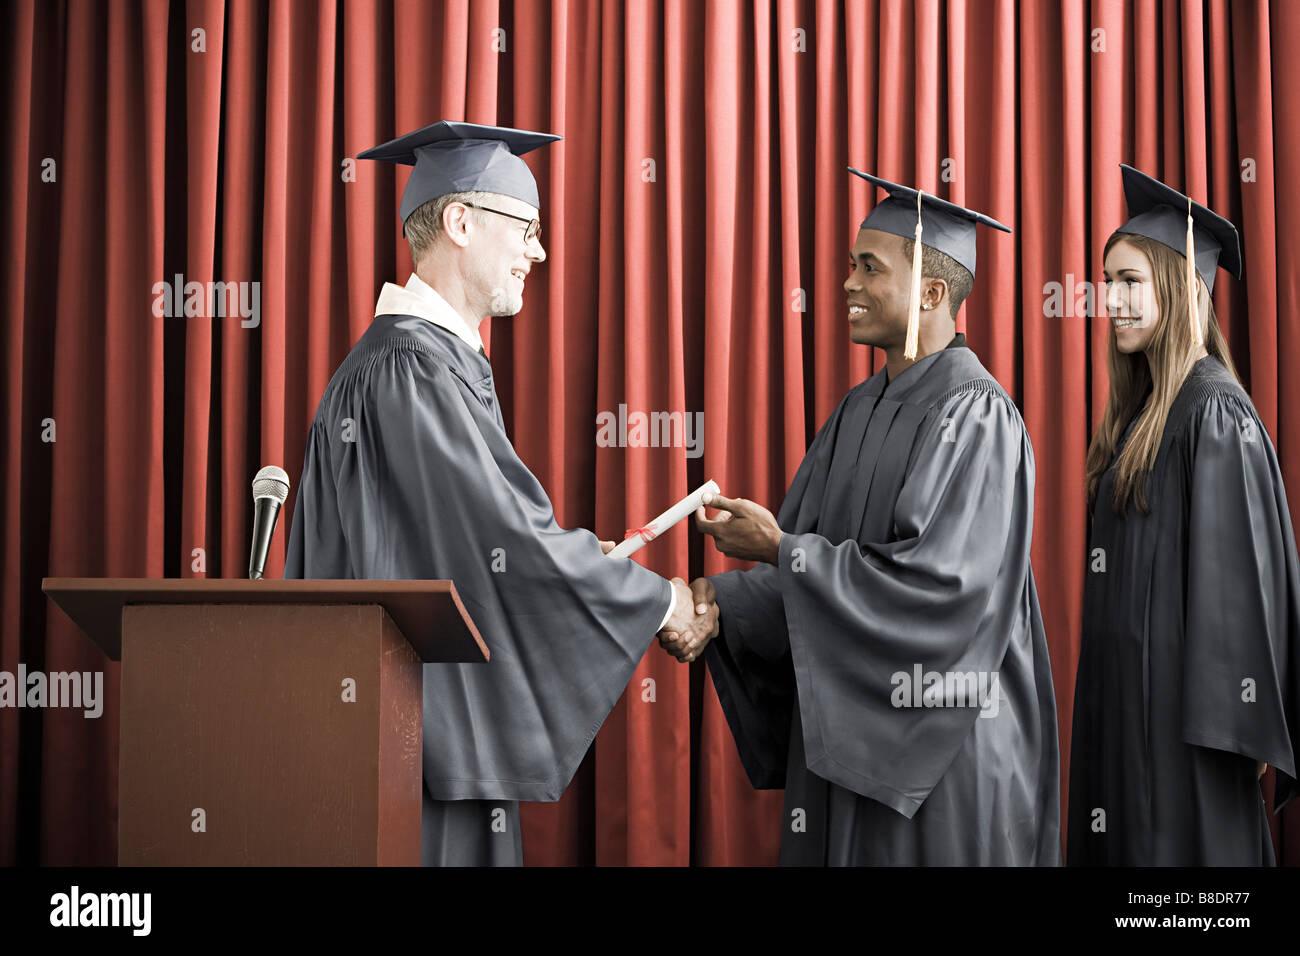 Graduation - Stock Image